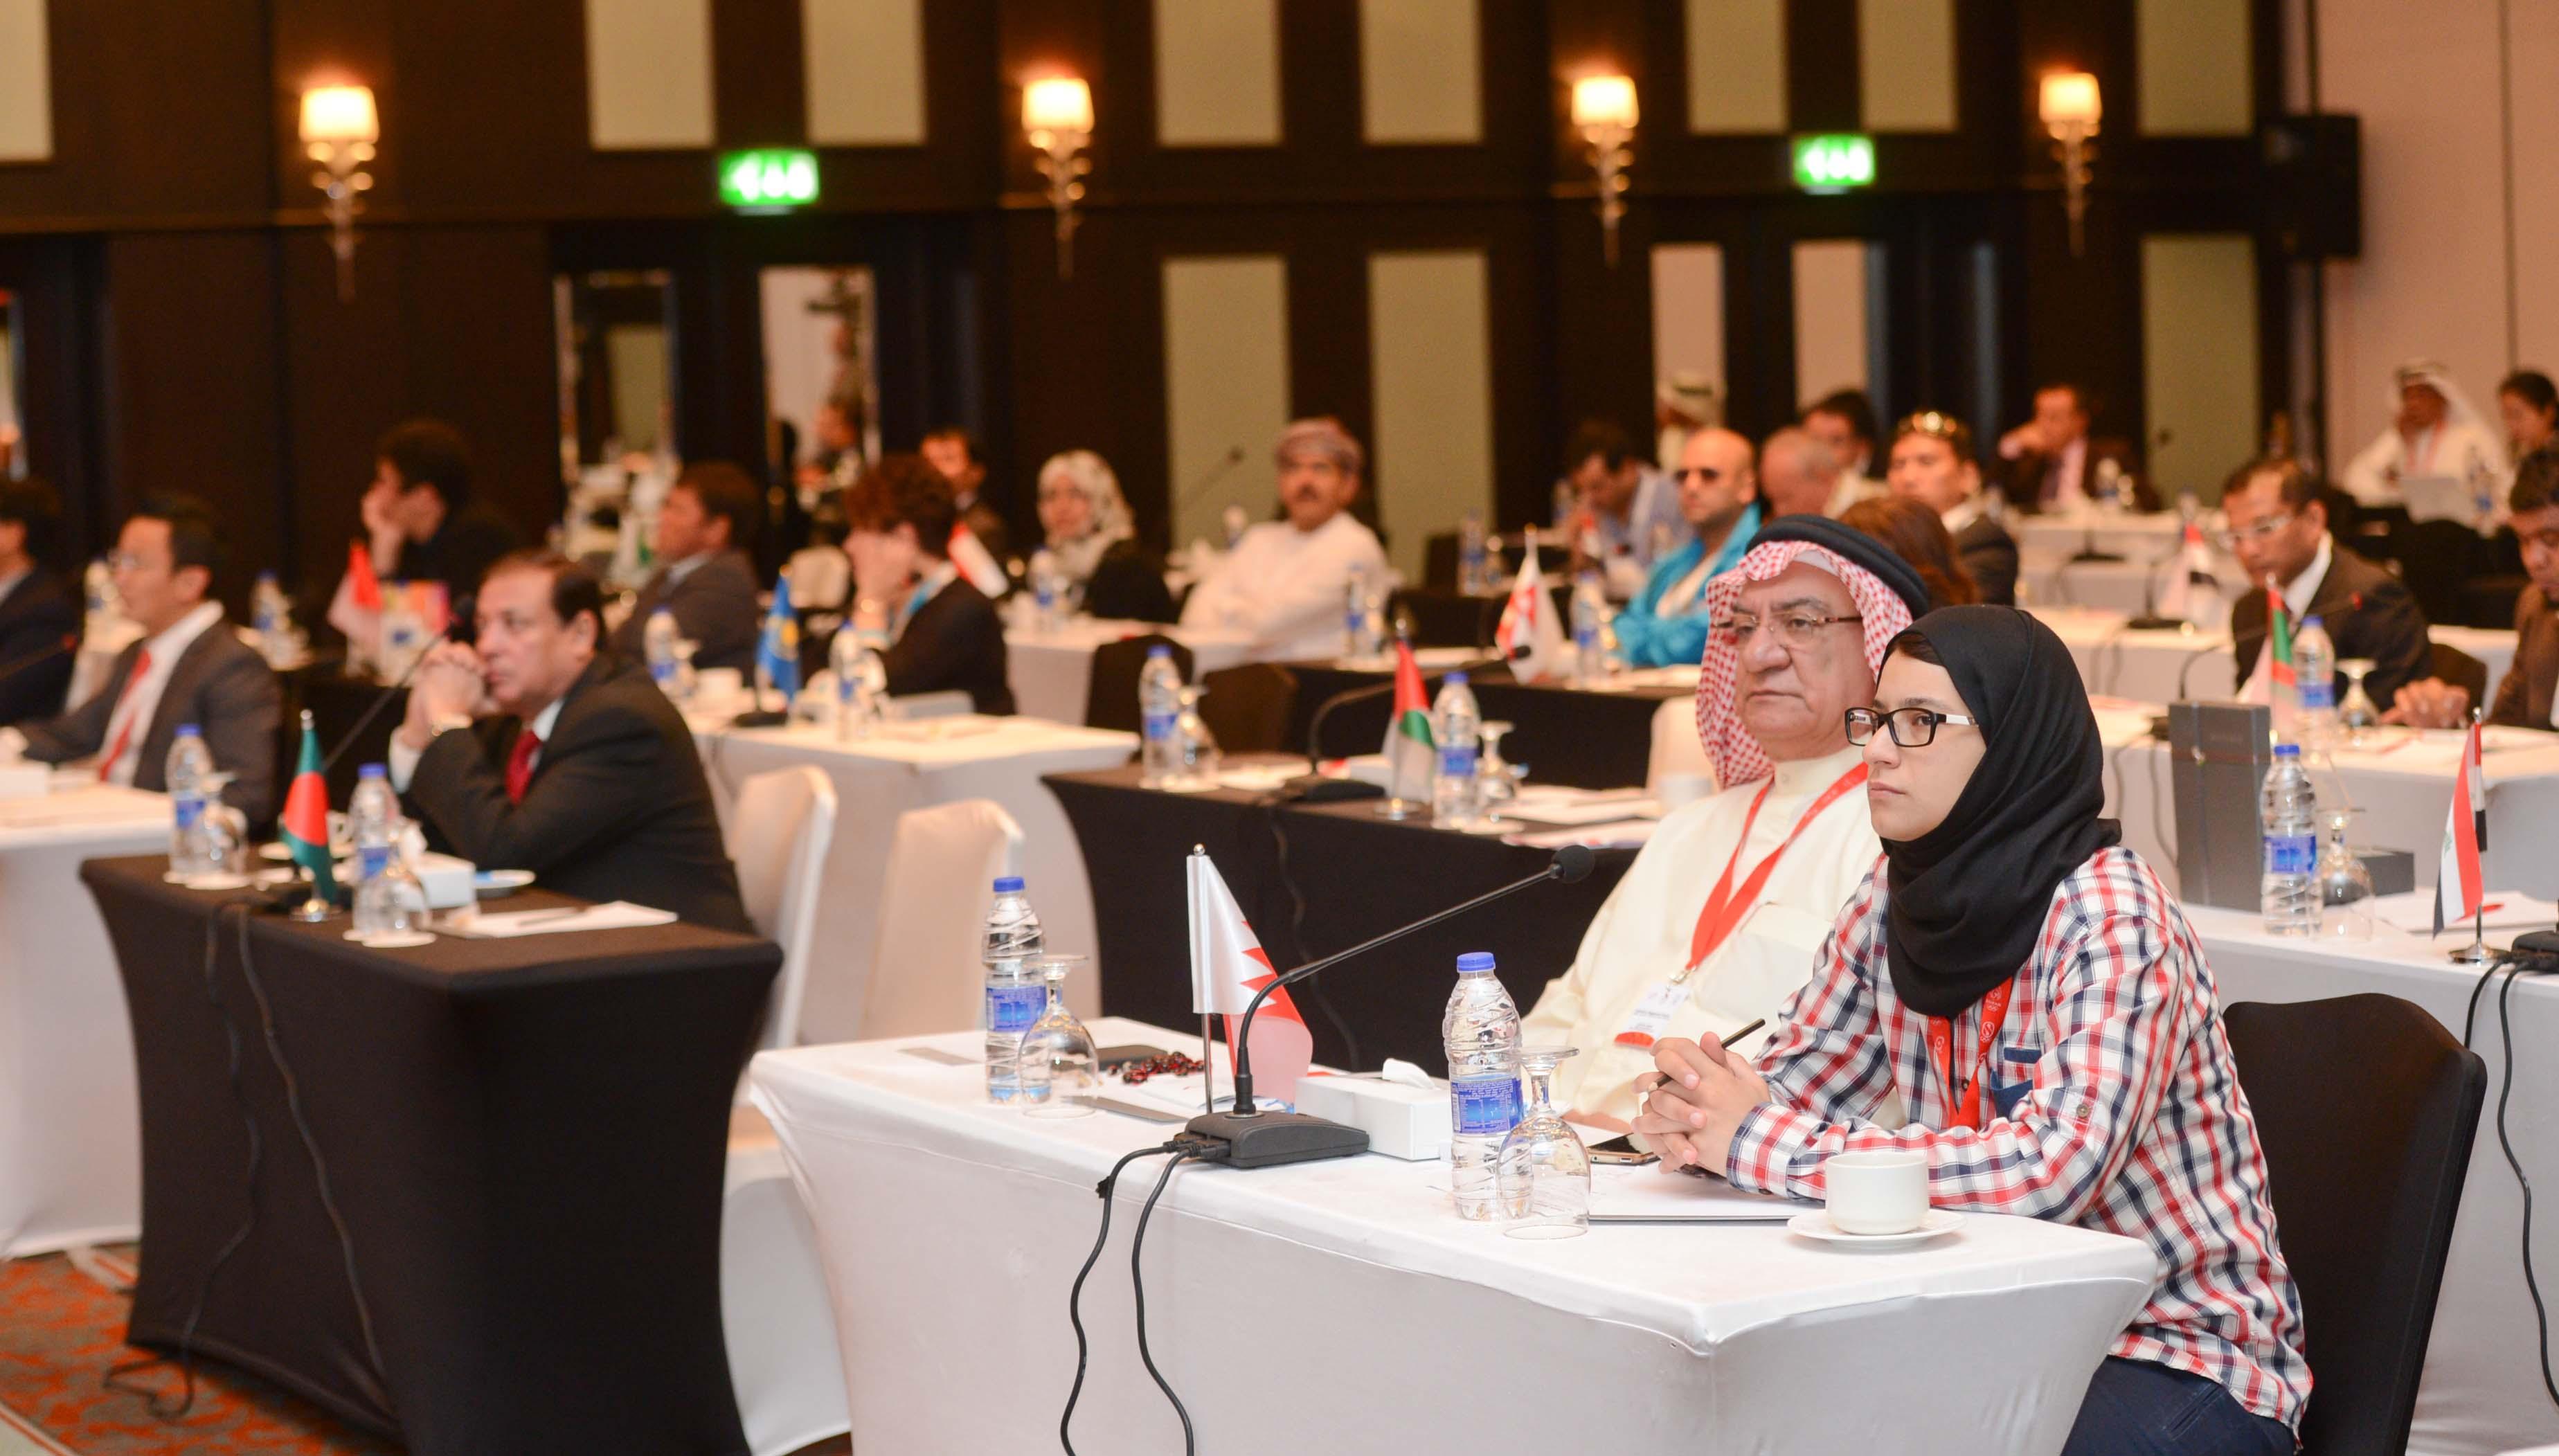 Delegates listen to presentations during the OCA Regional Forum in Bahrain ©BOC